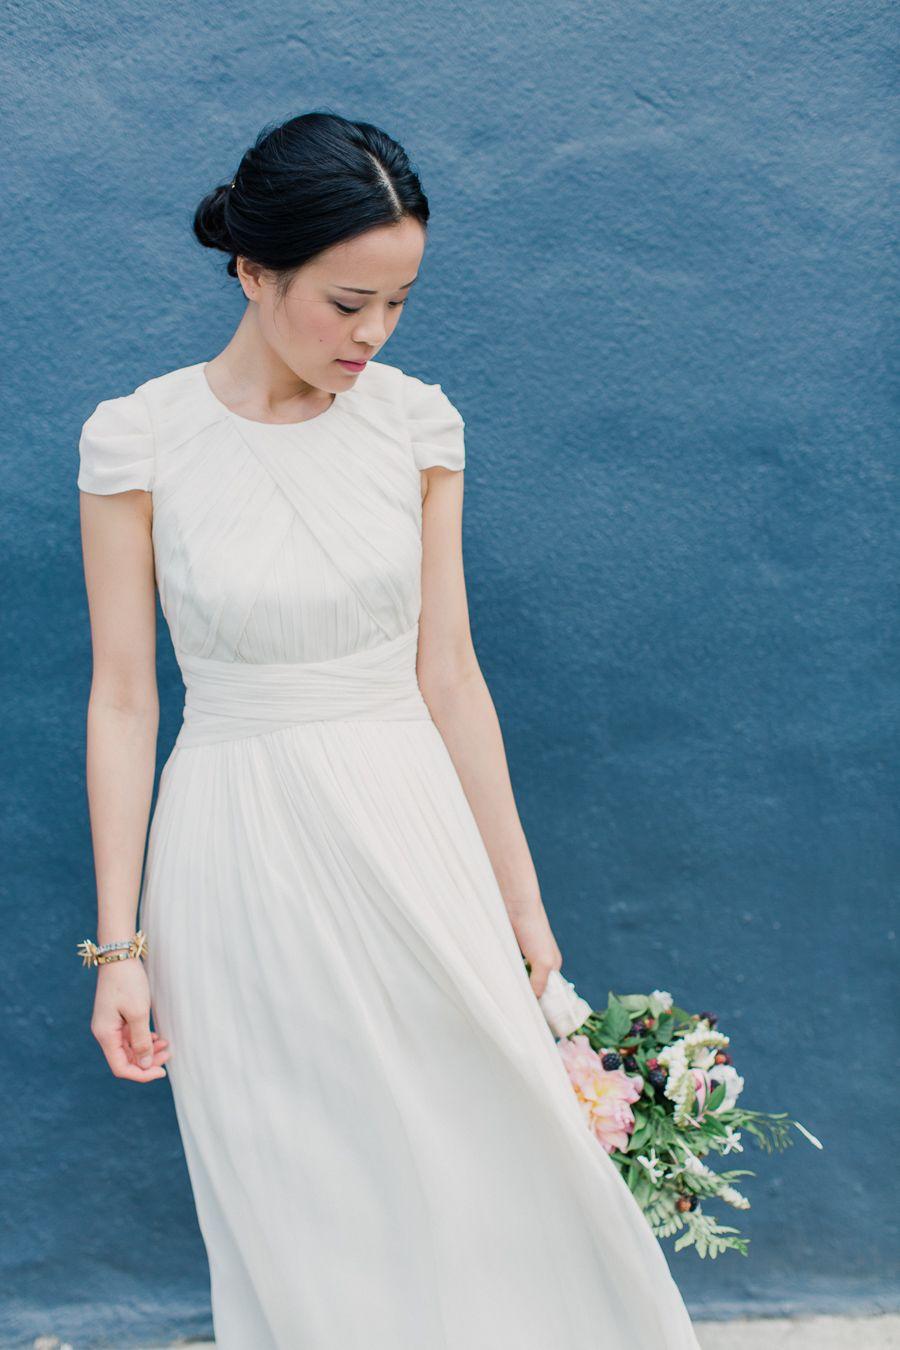 Trending: Ultra-Flattering Short Sleeve Wedding Dresses | Wedding ...